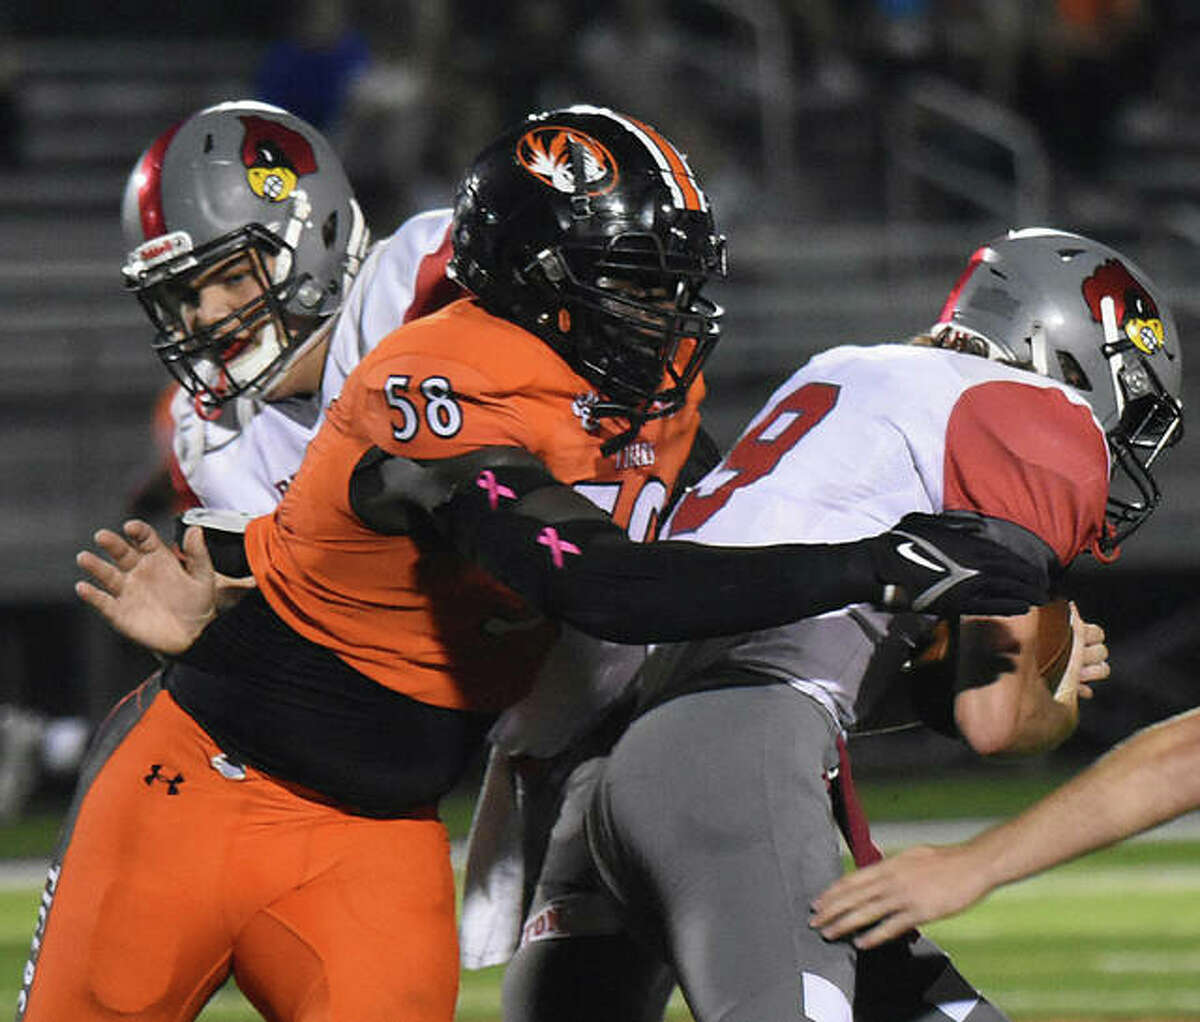 Edwardsville defensive tackle Nasim Cairo pulls down Alton quarterback Grant McAfoos for one of his four sacks.